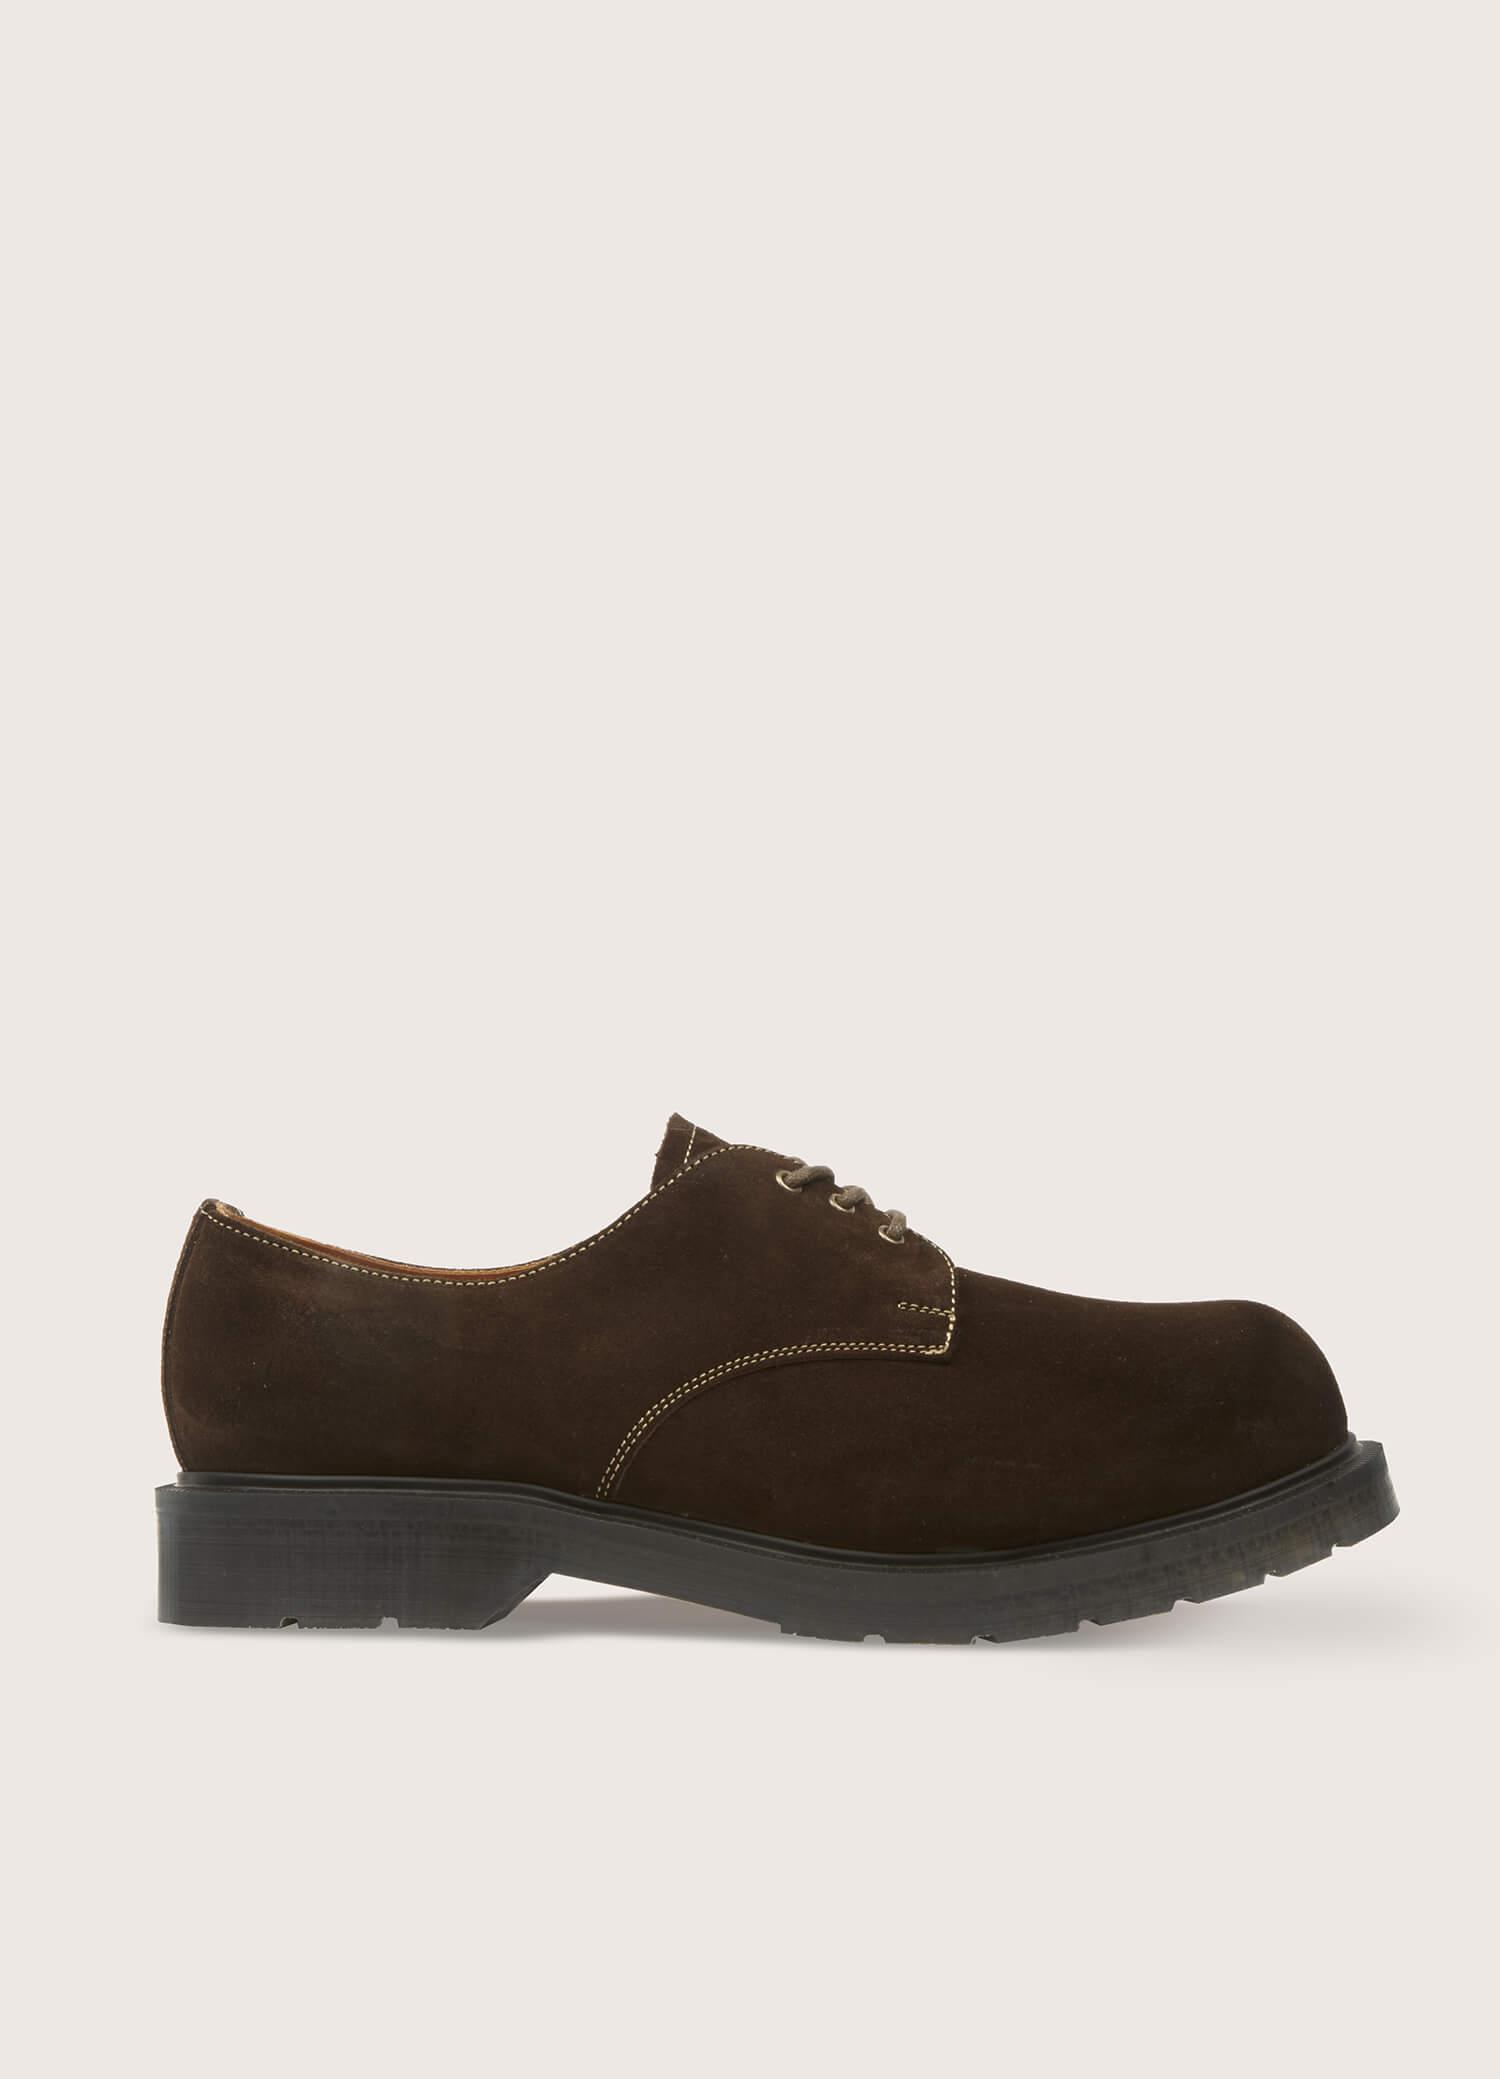 Solovair x YMC Men's Gibson Suede Shoes Brown